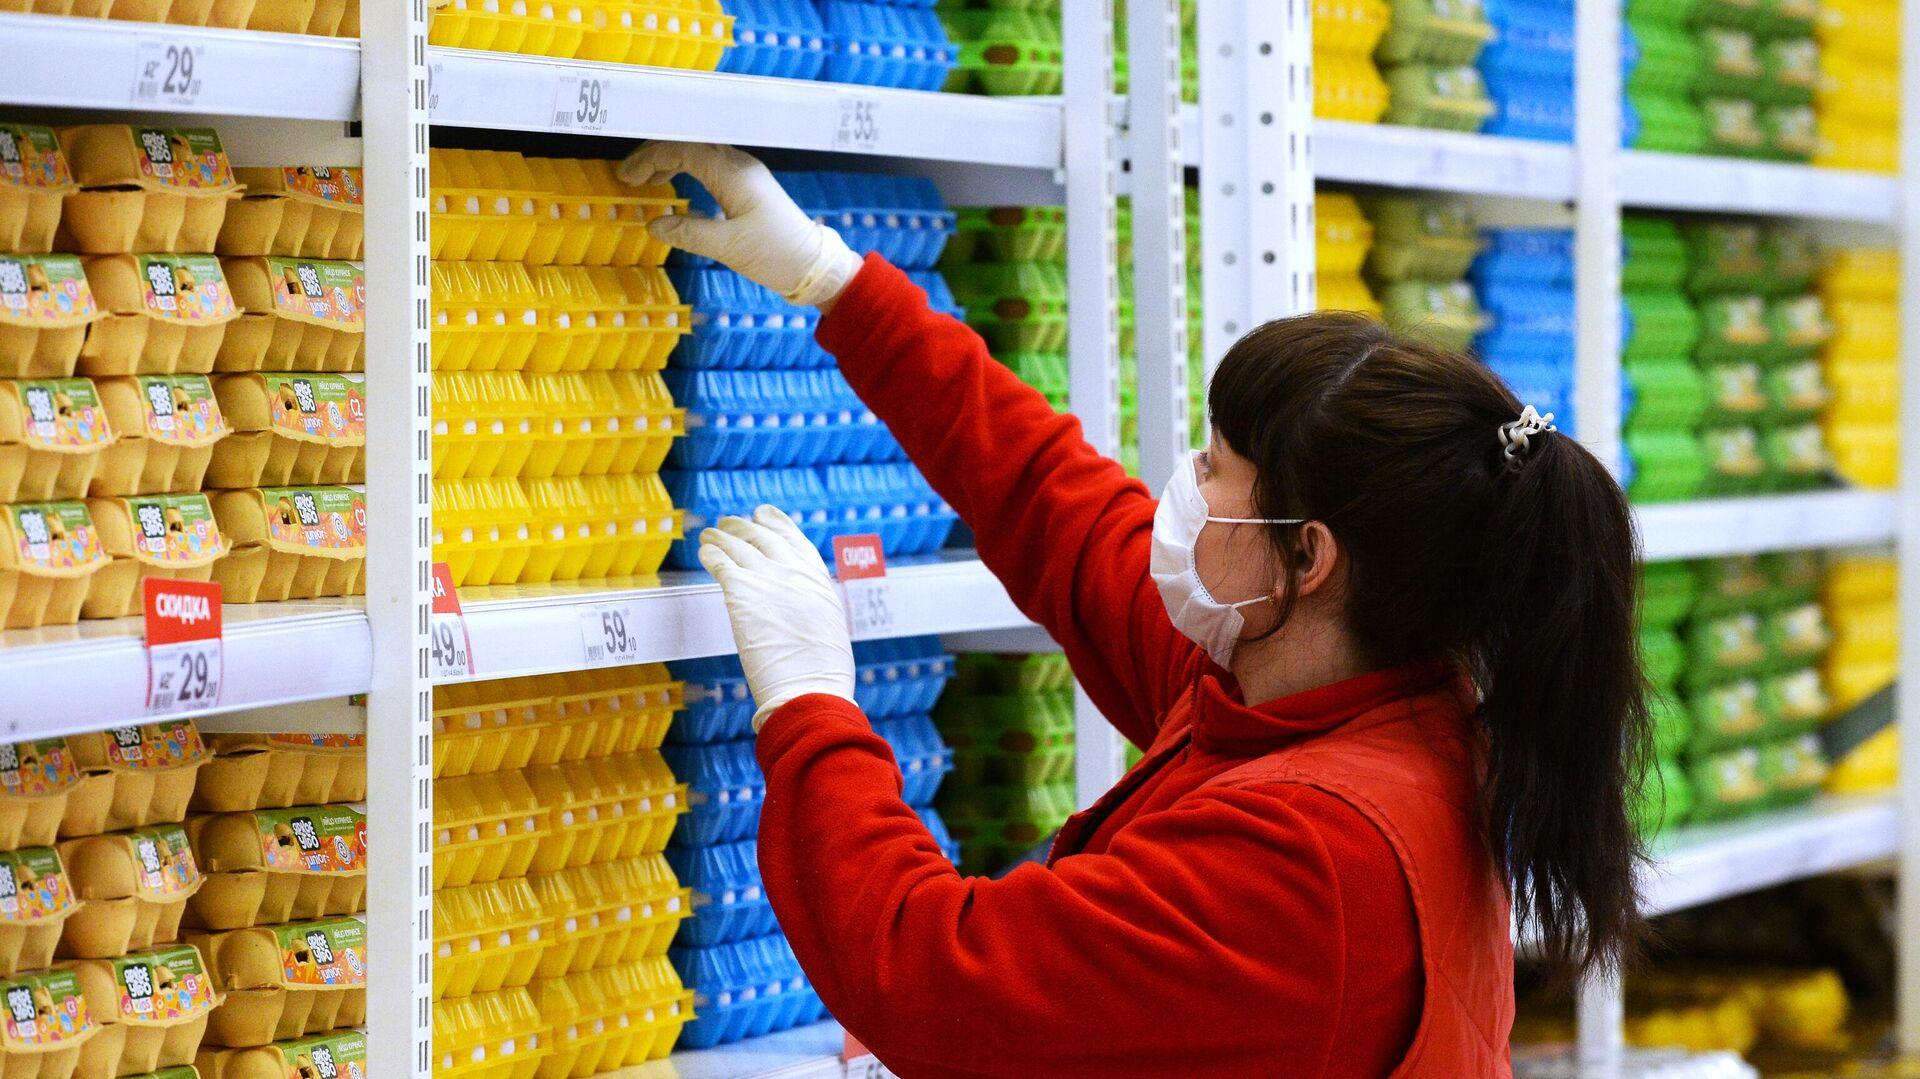 Сотрудник магазина в гипермаркете Ашан в Новосибирске - РИА Новости, 1920, 09.07.2021